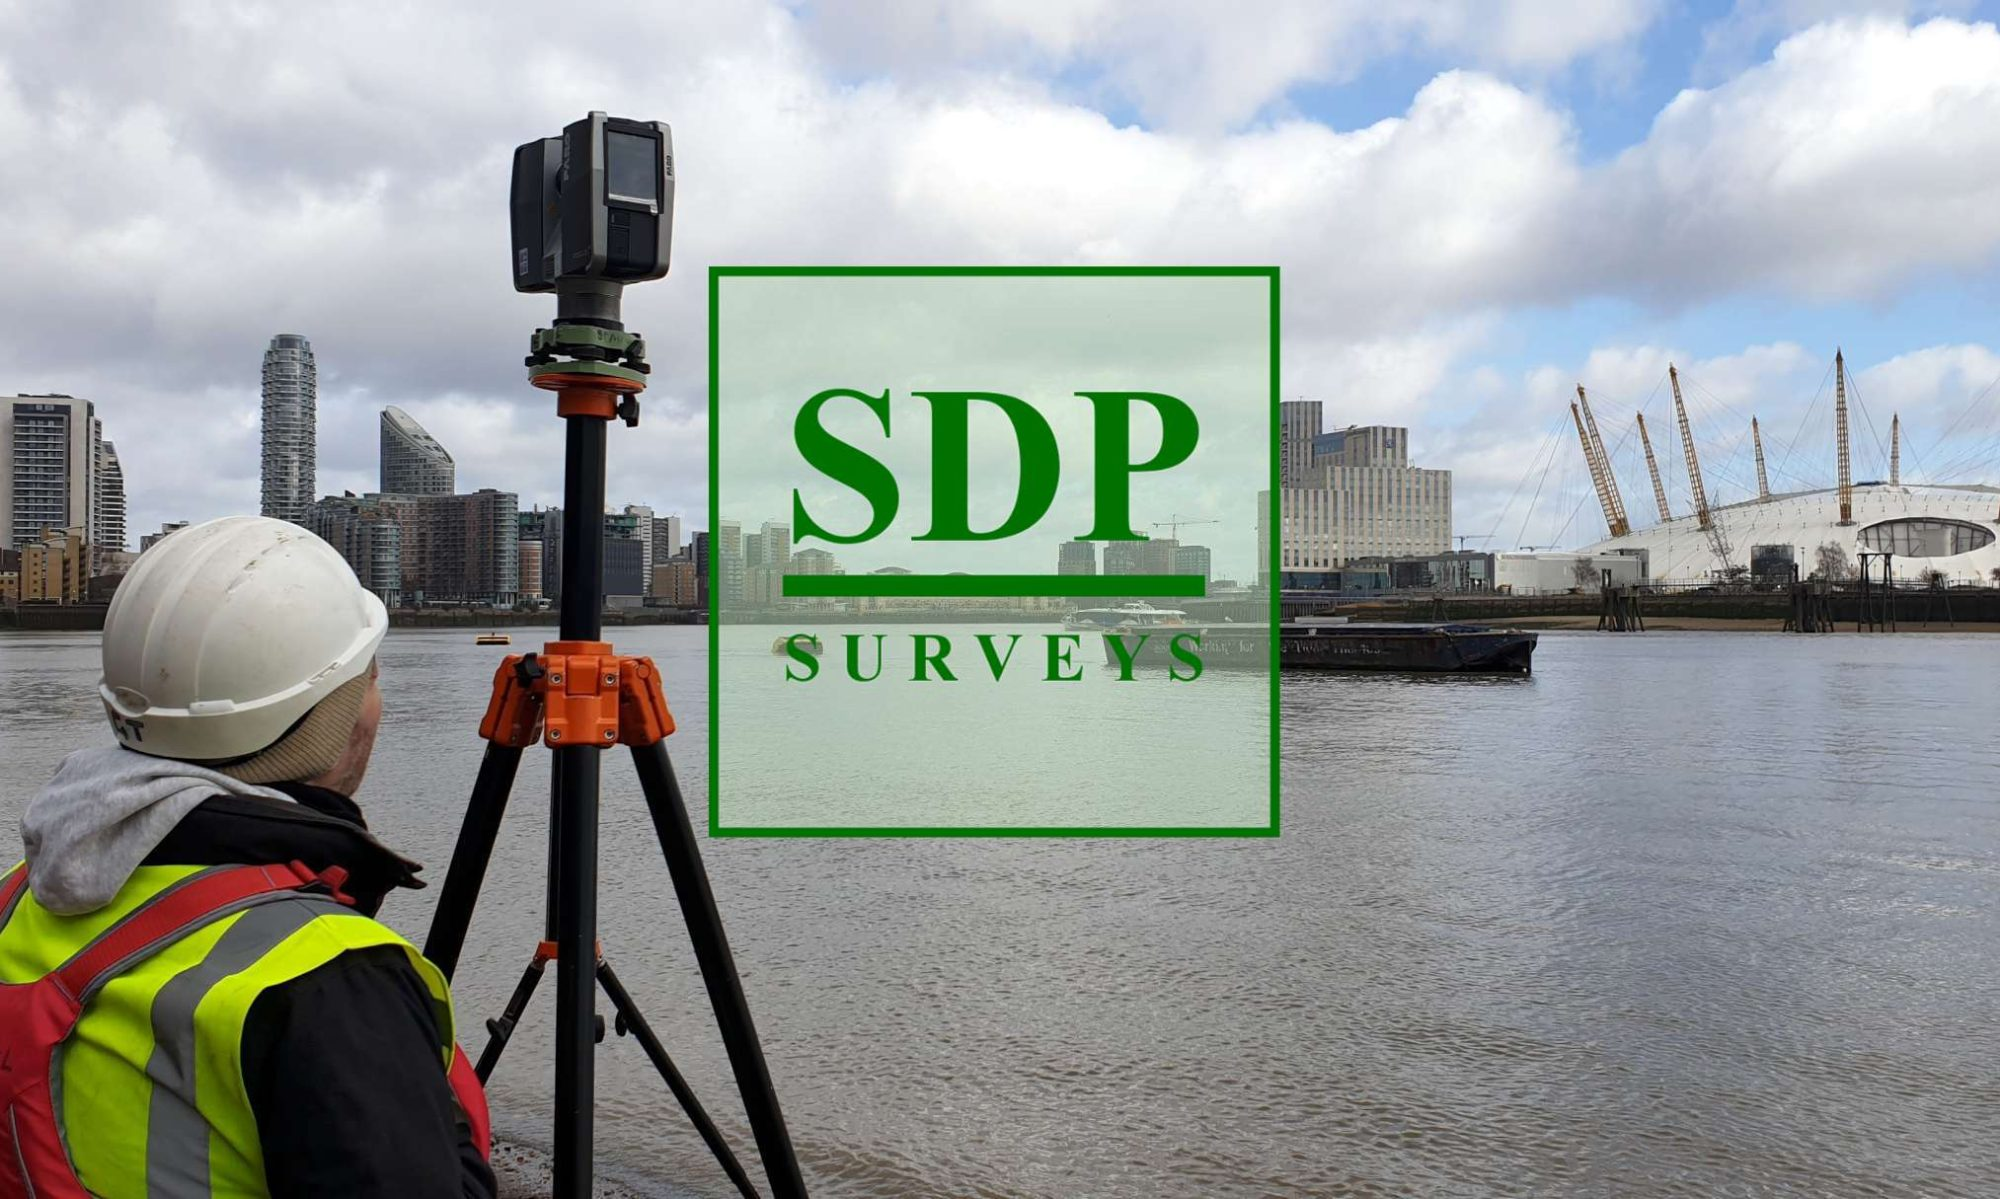 SDP SURVEYS